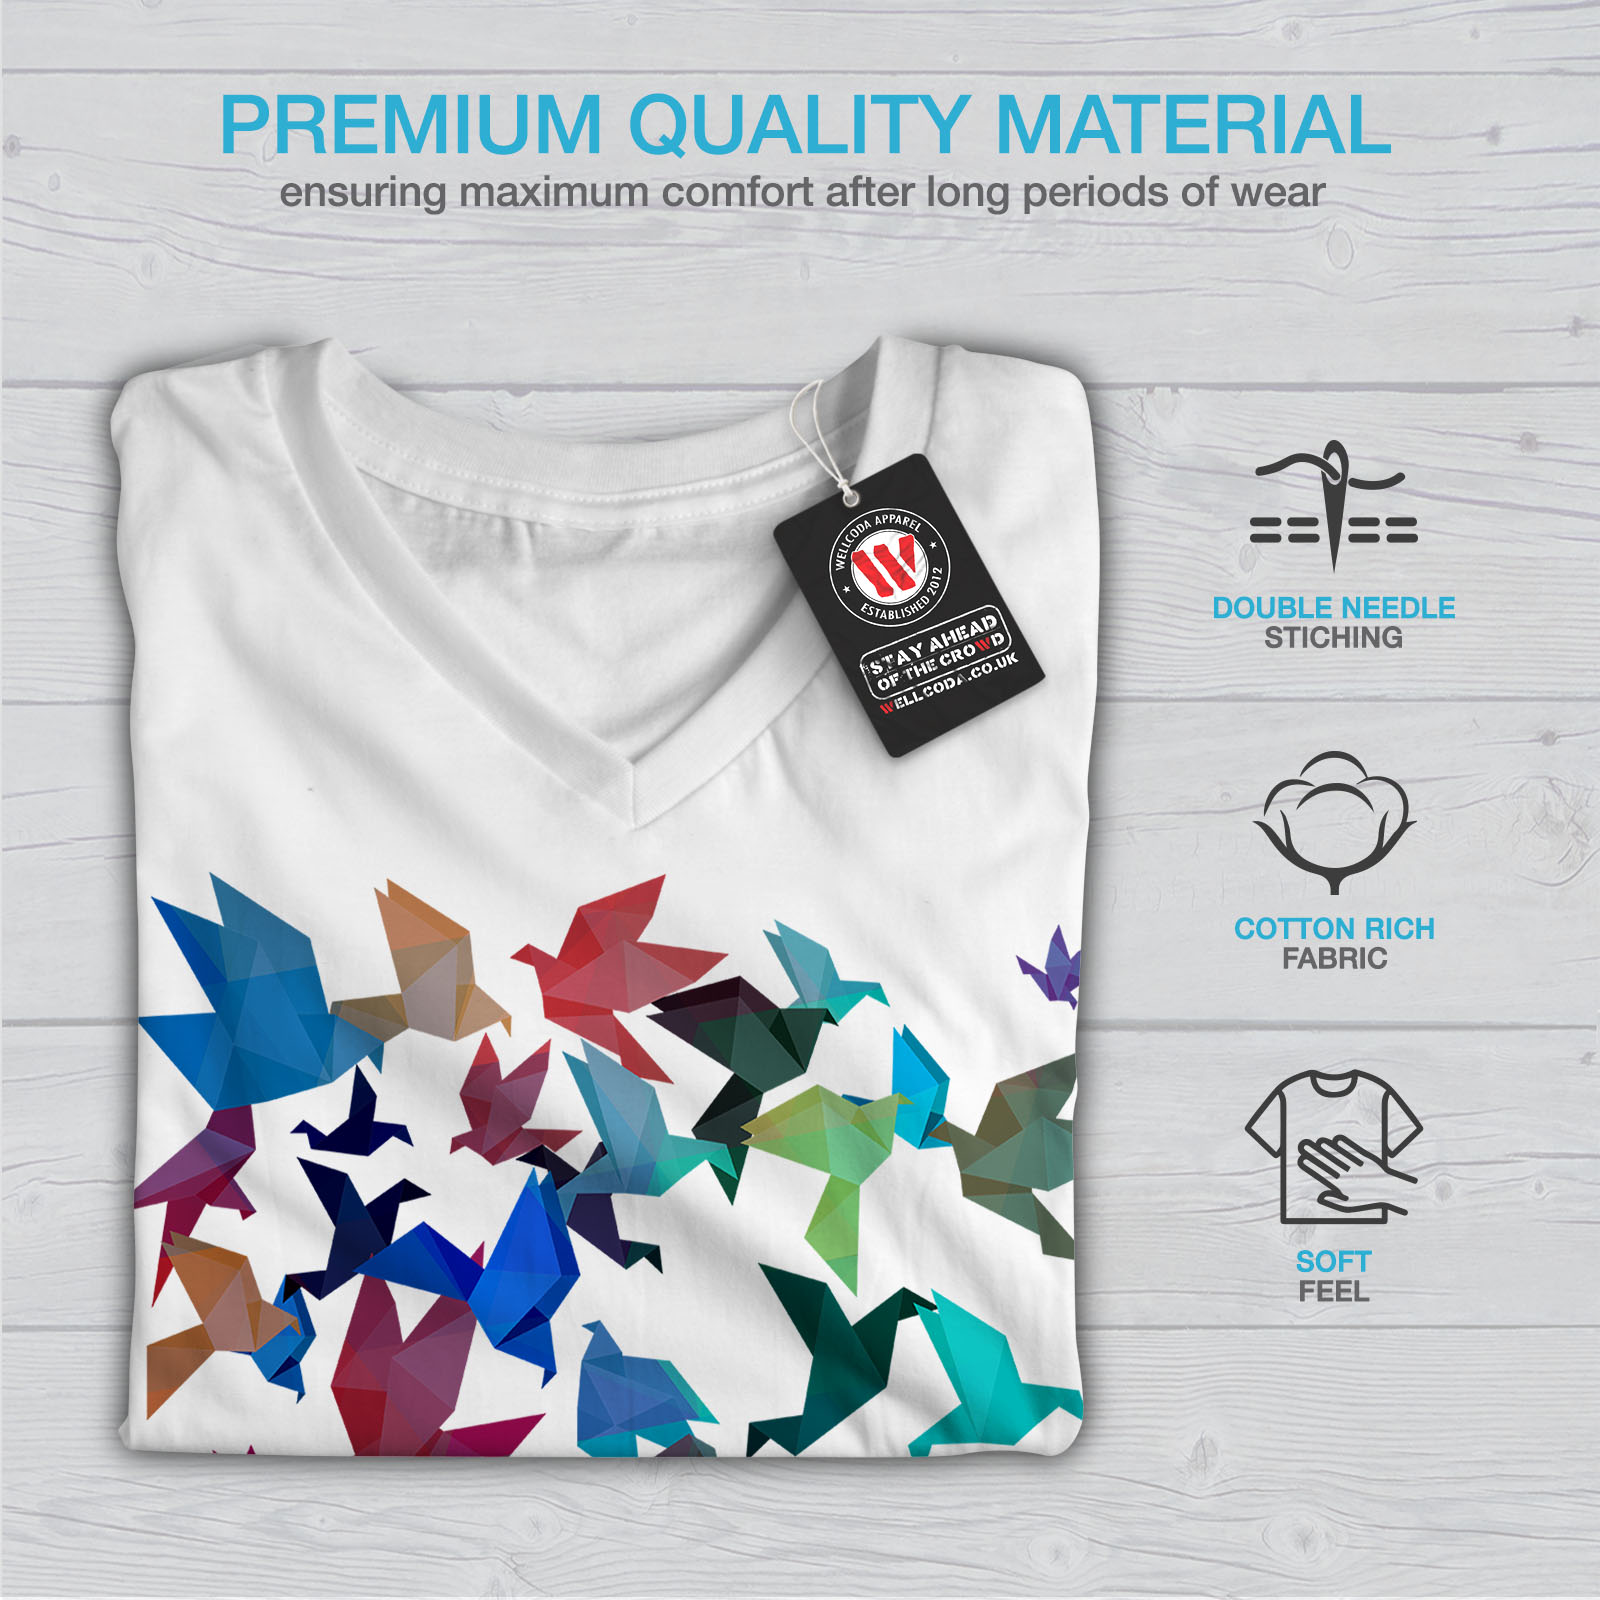 Wellcoda-Origami-Bird-Colors-Womens-V-Neck-T-shirt-Craft-Graphic-Design-Tee thumbnail 9